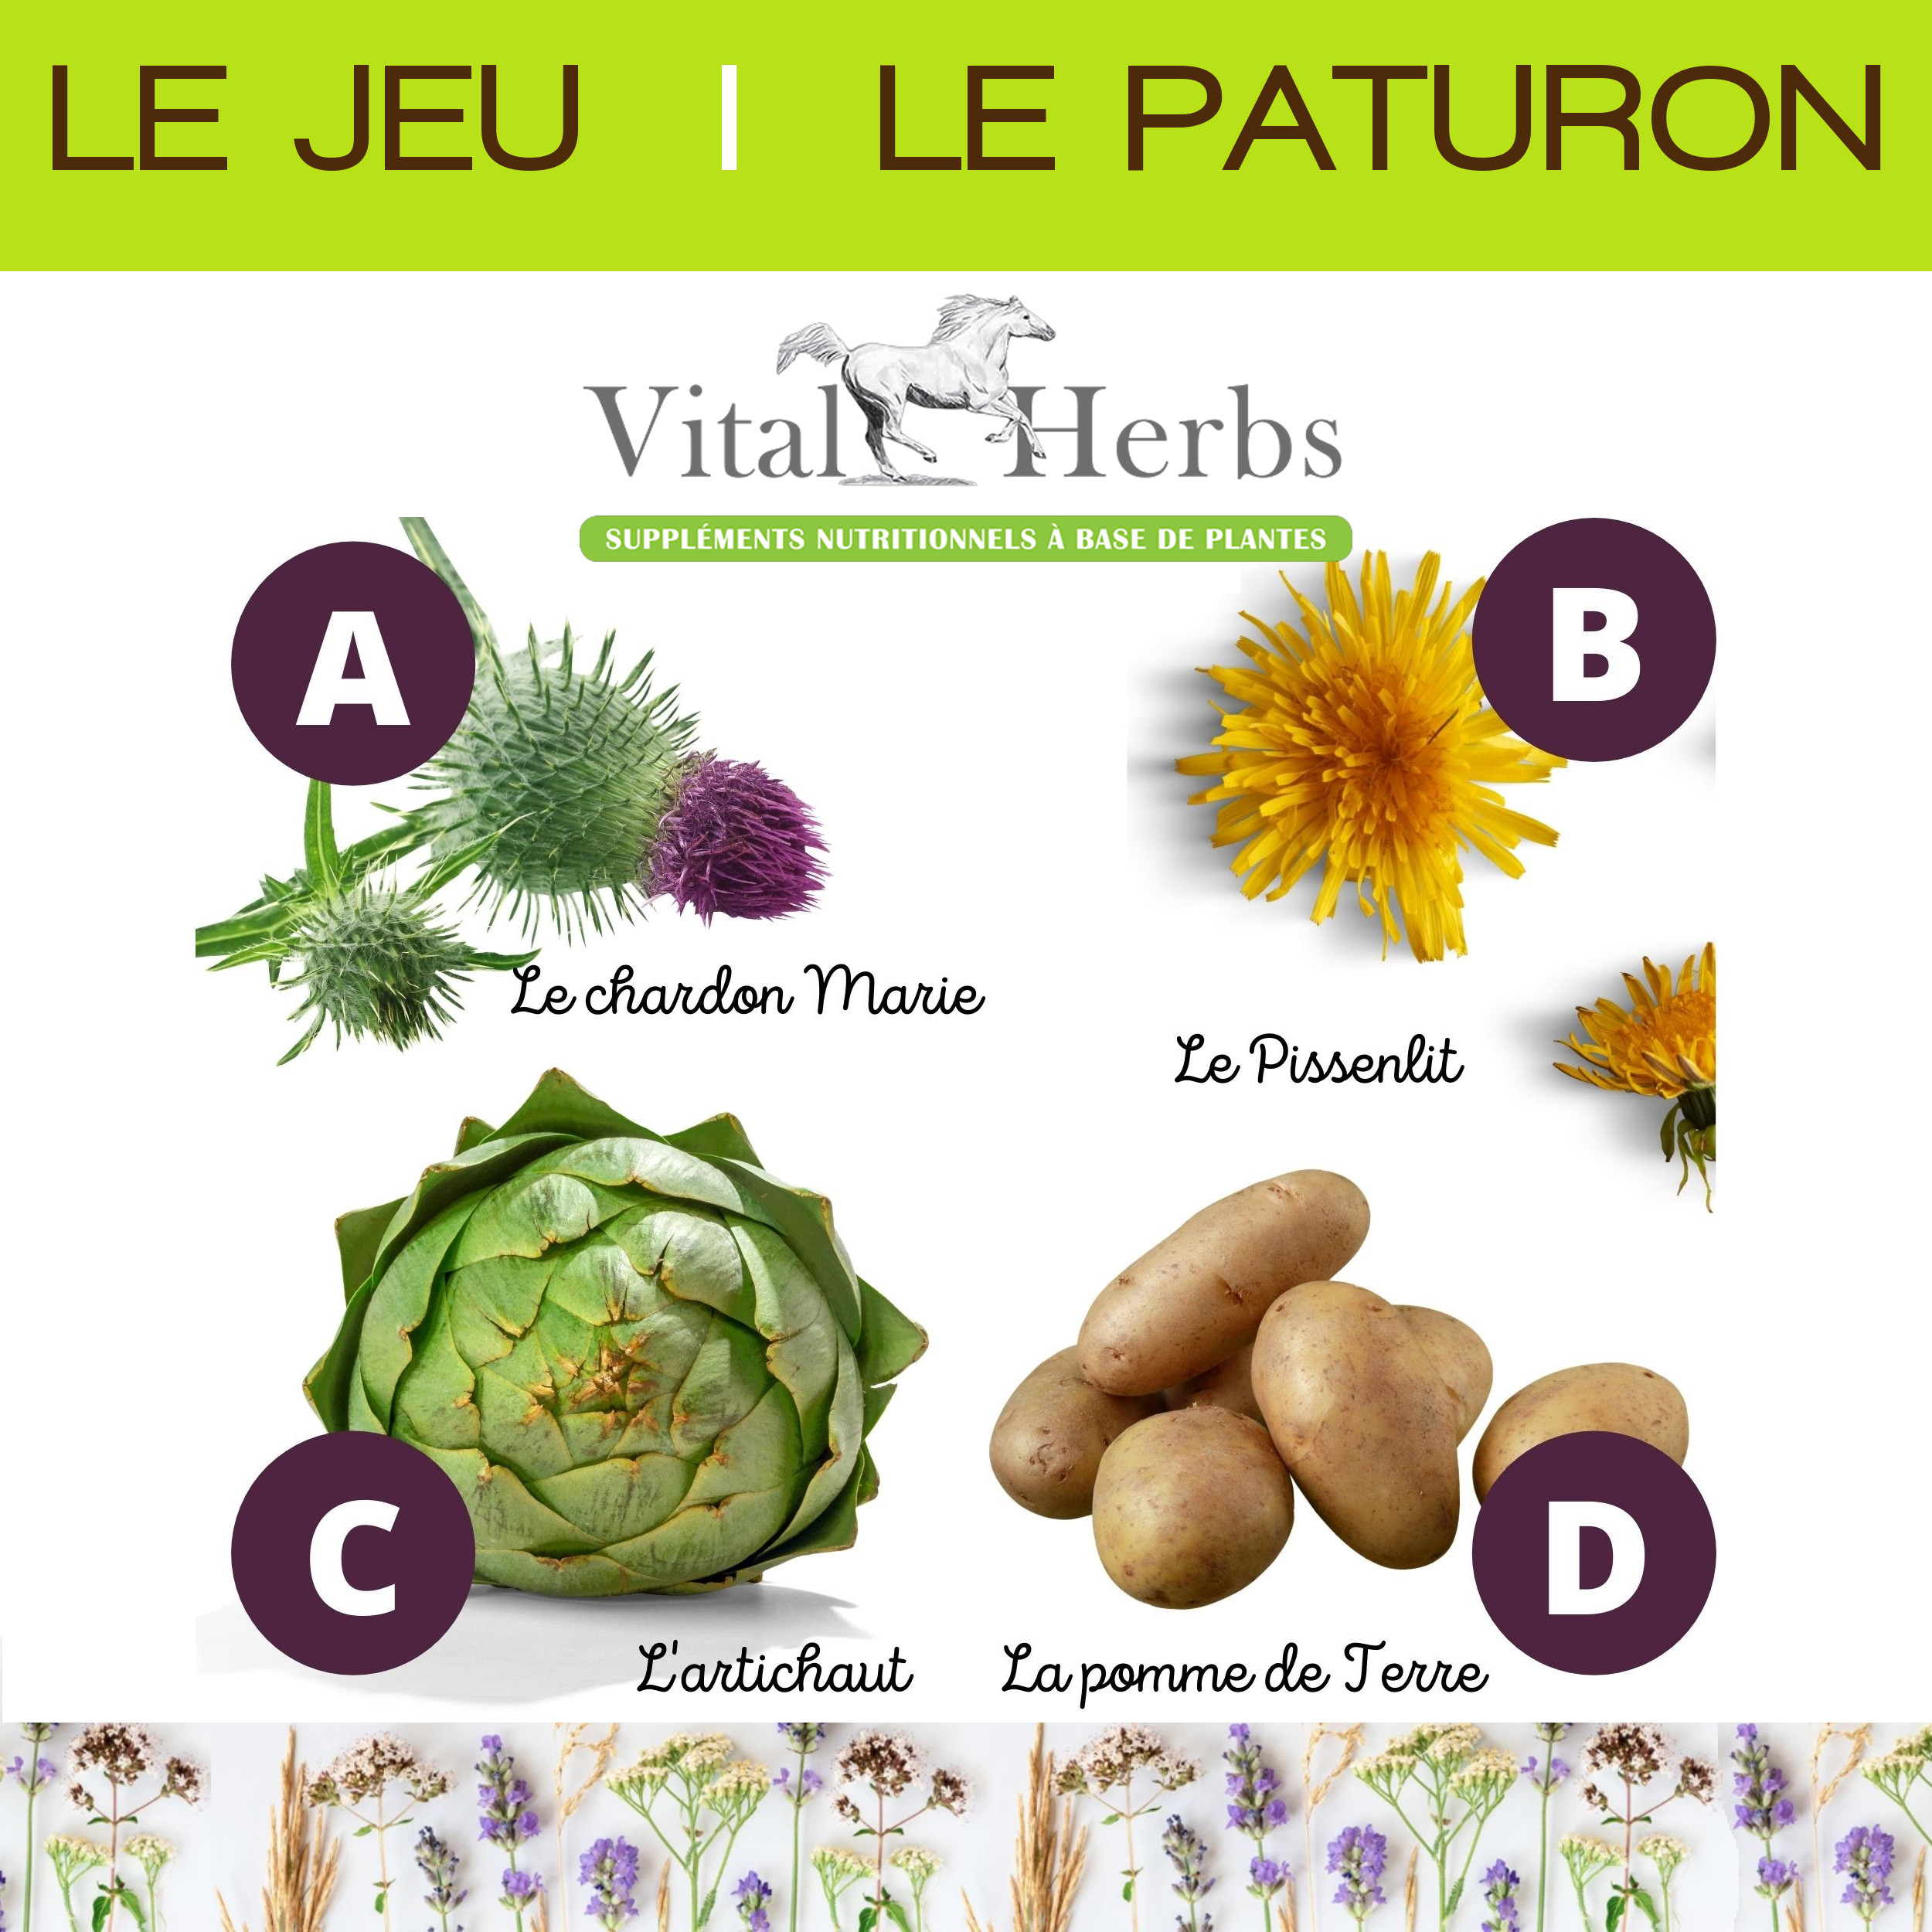 Jeu Vital Herbs - Le Paturon